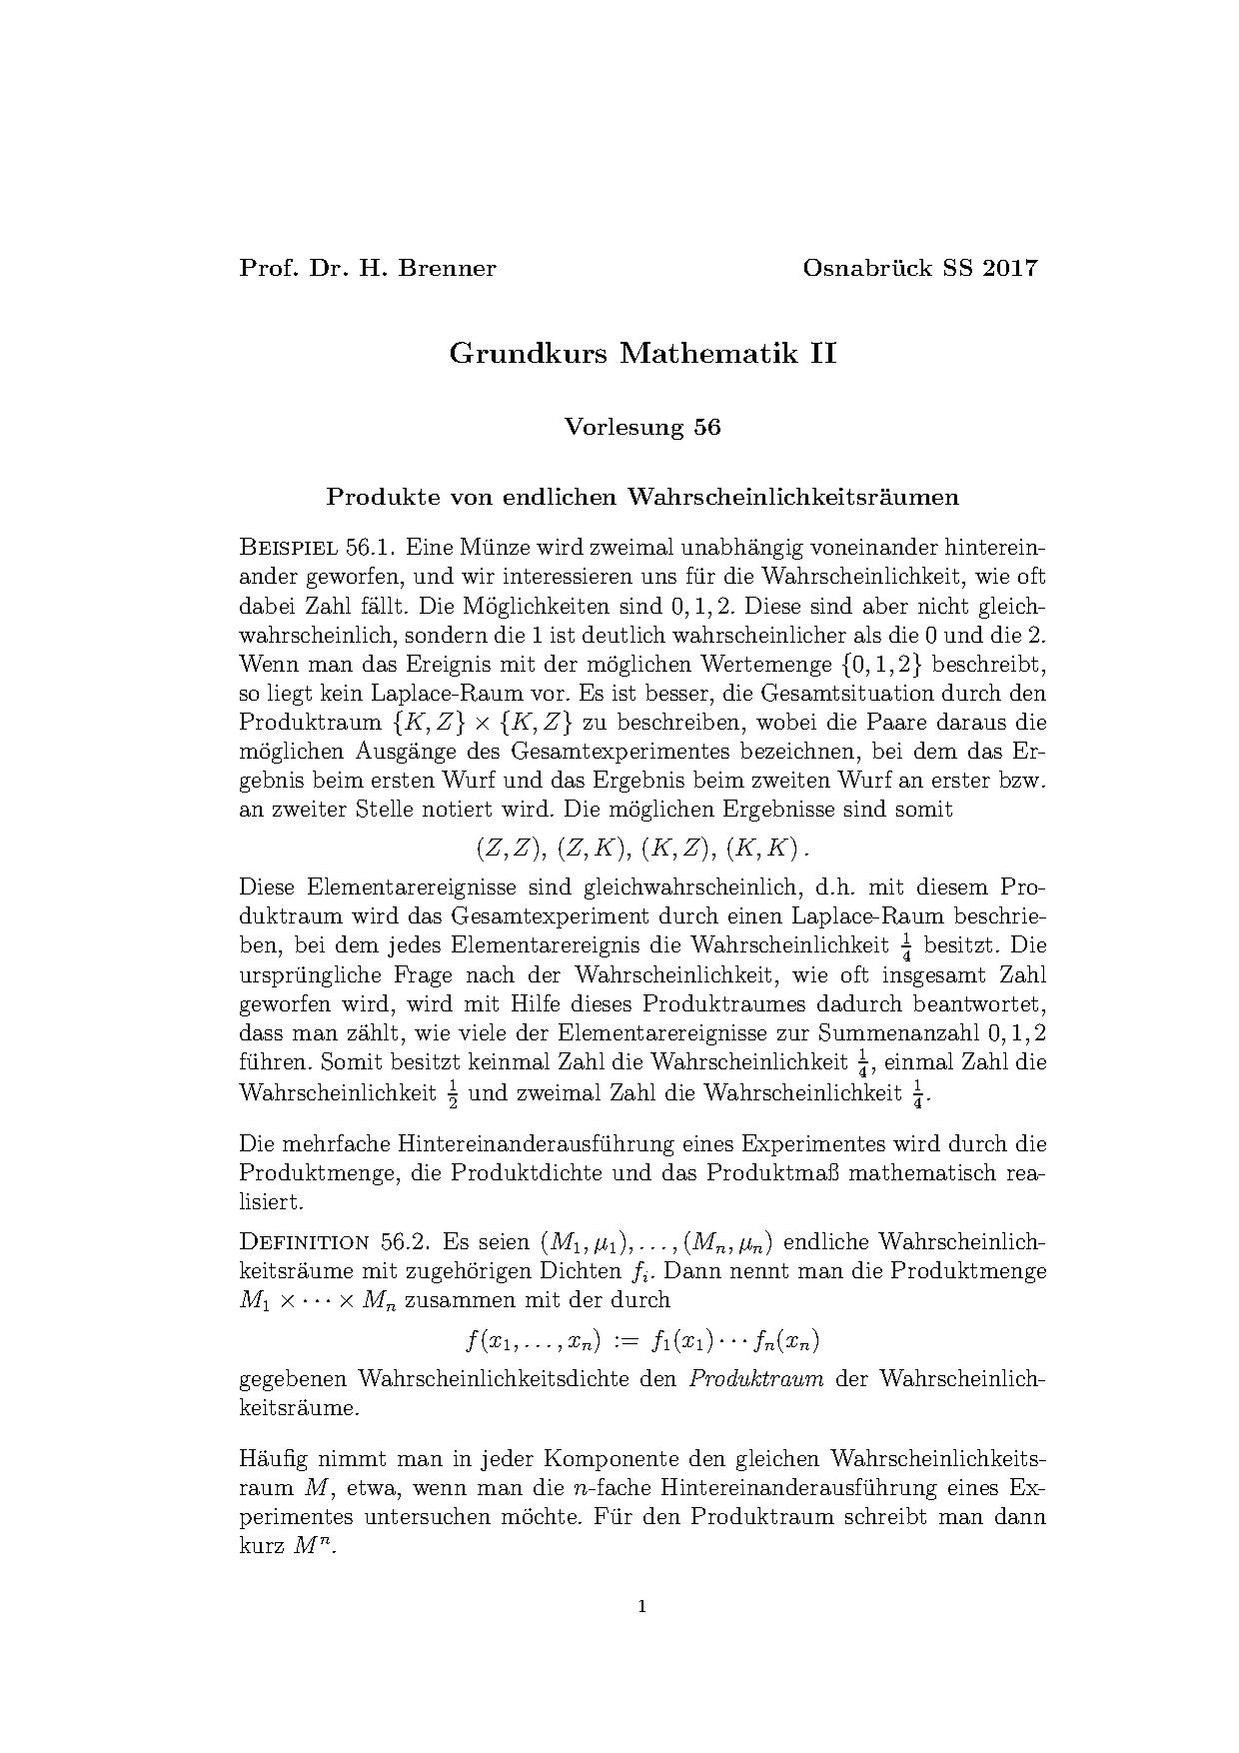 File:Grundkurs Mathematik (Osnabrück 2016-2017)Teil IIVorlesung56 ...